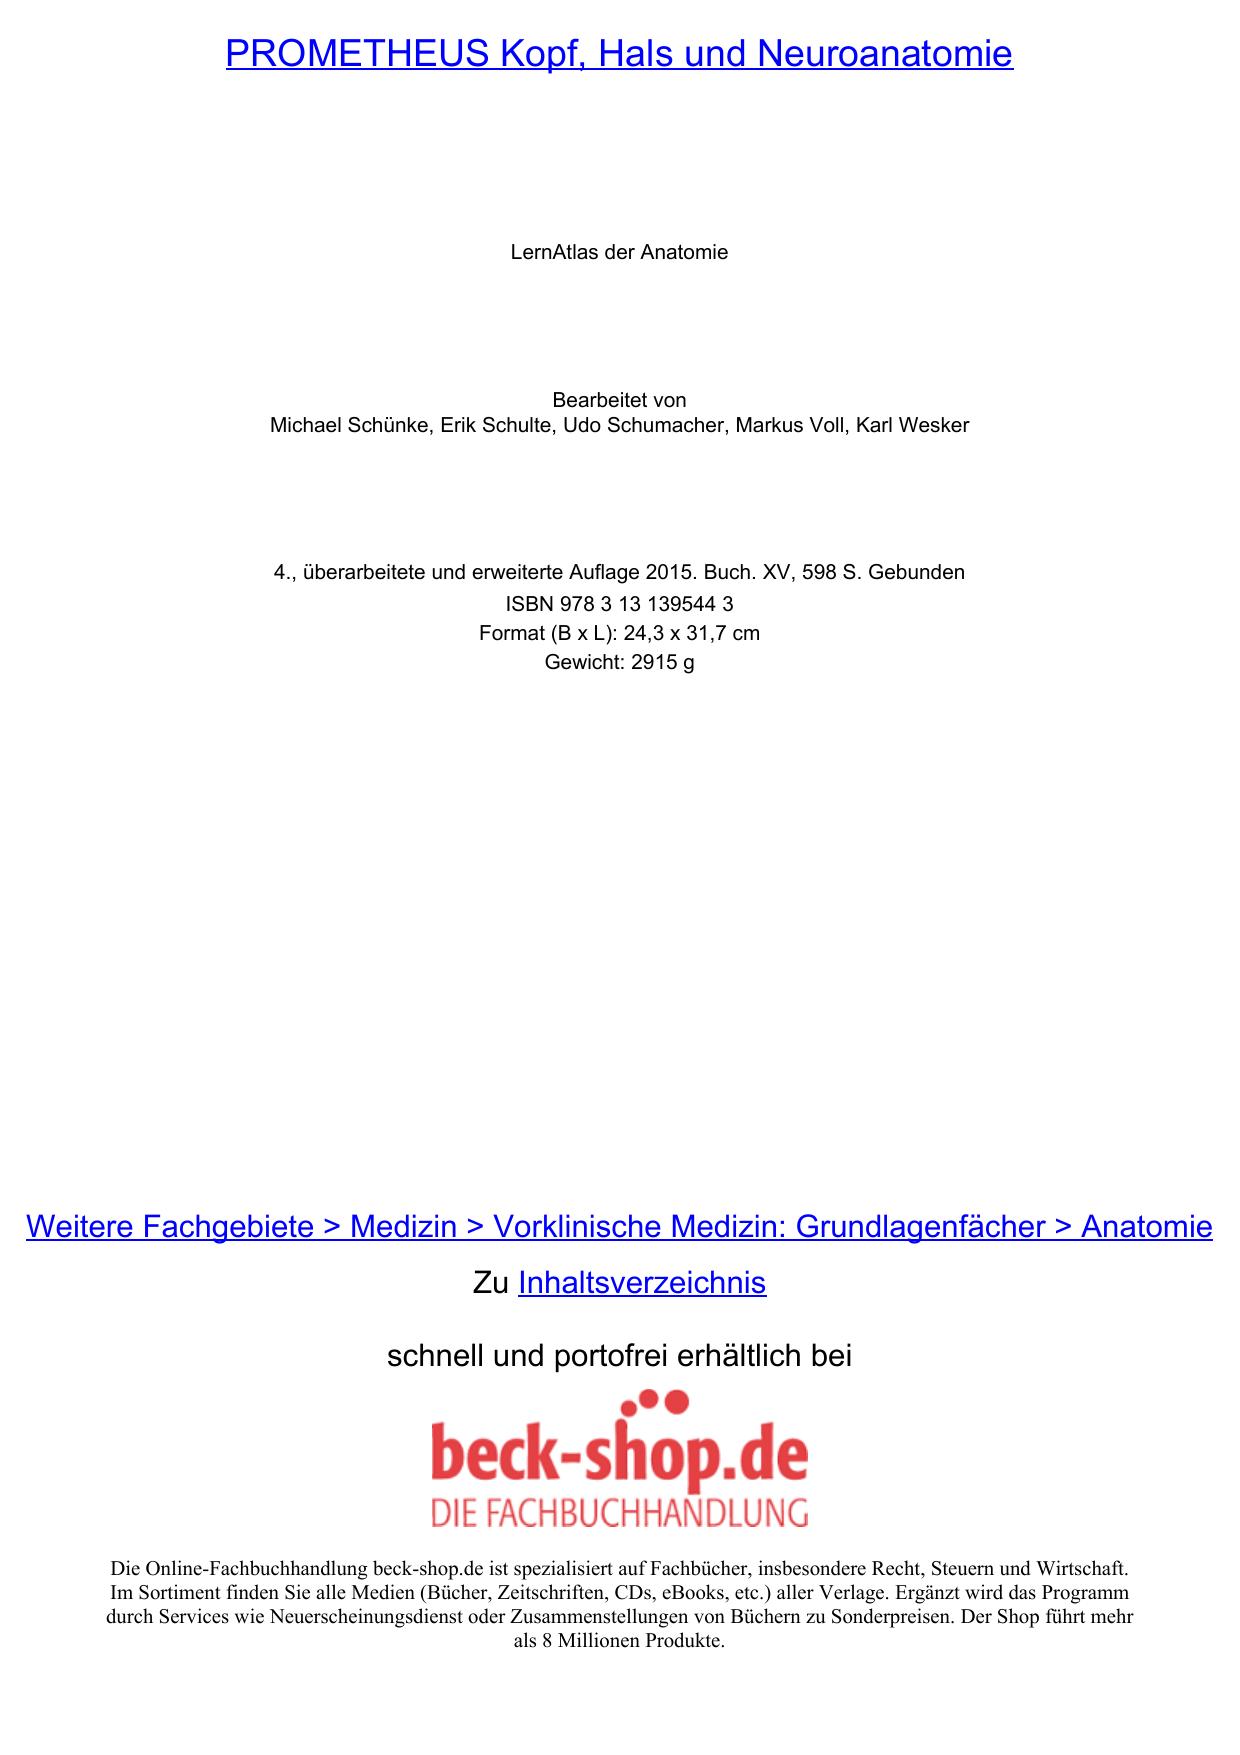 PROMETHEUS Kopf, Hals und Neuroanatomie - Beck-Shop